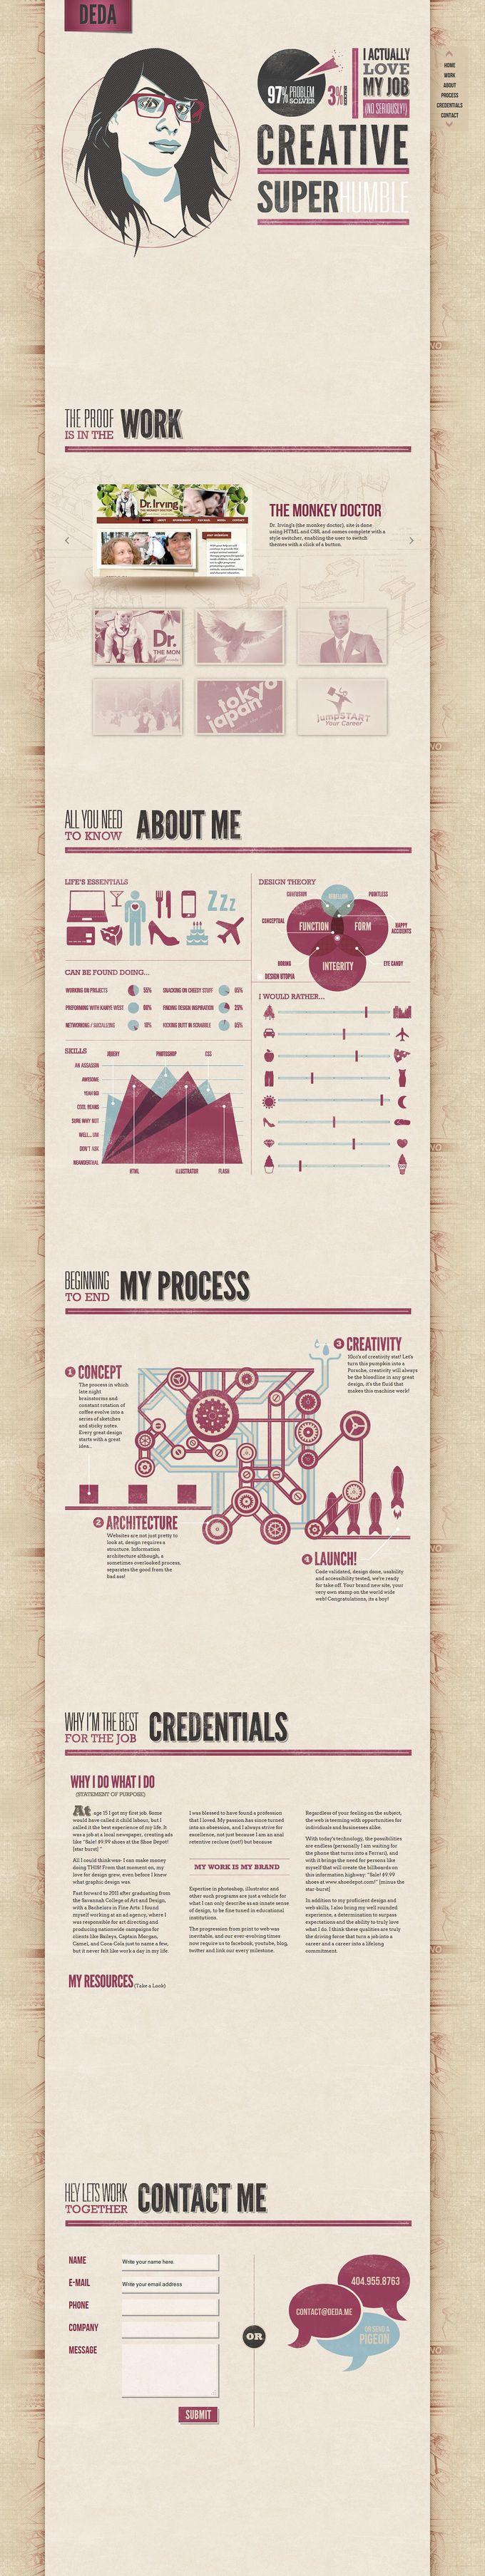 Creative Website Design - Personal Portfolio